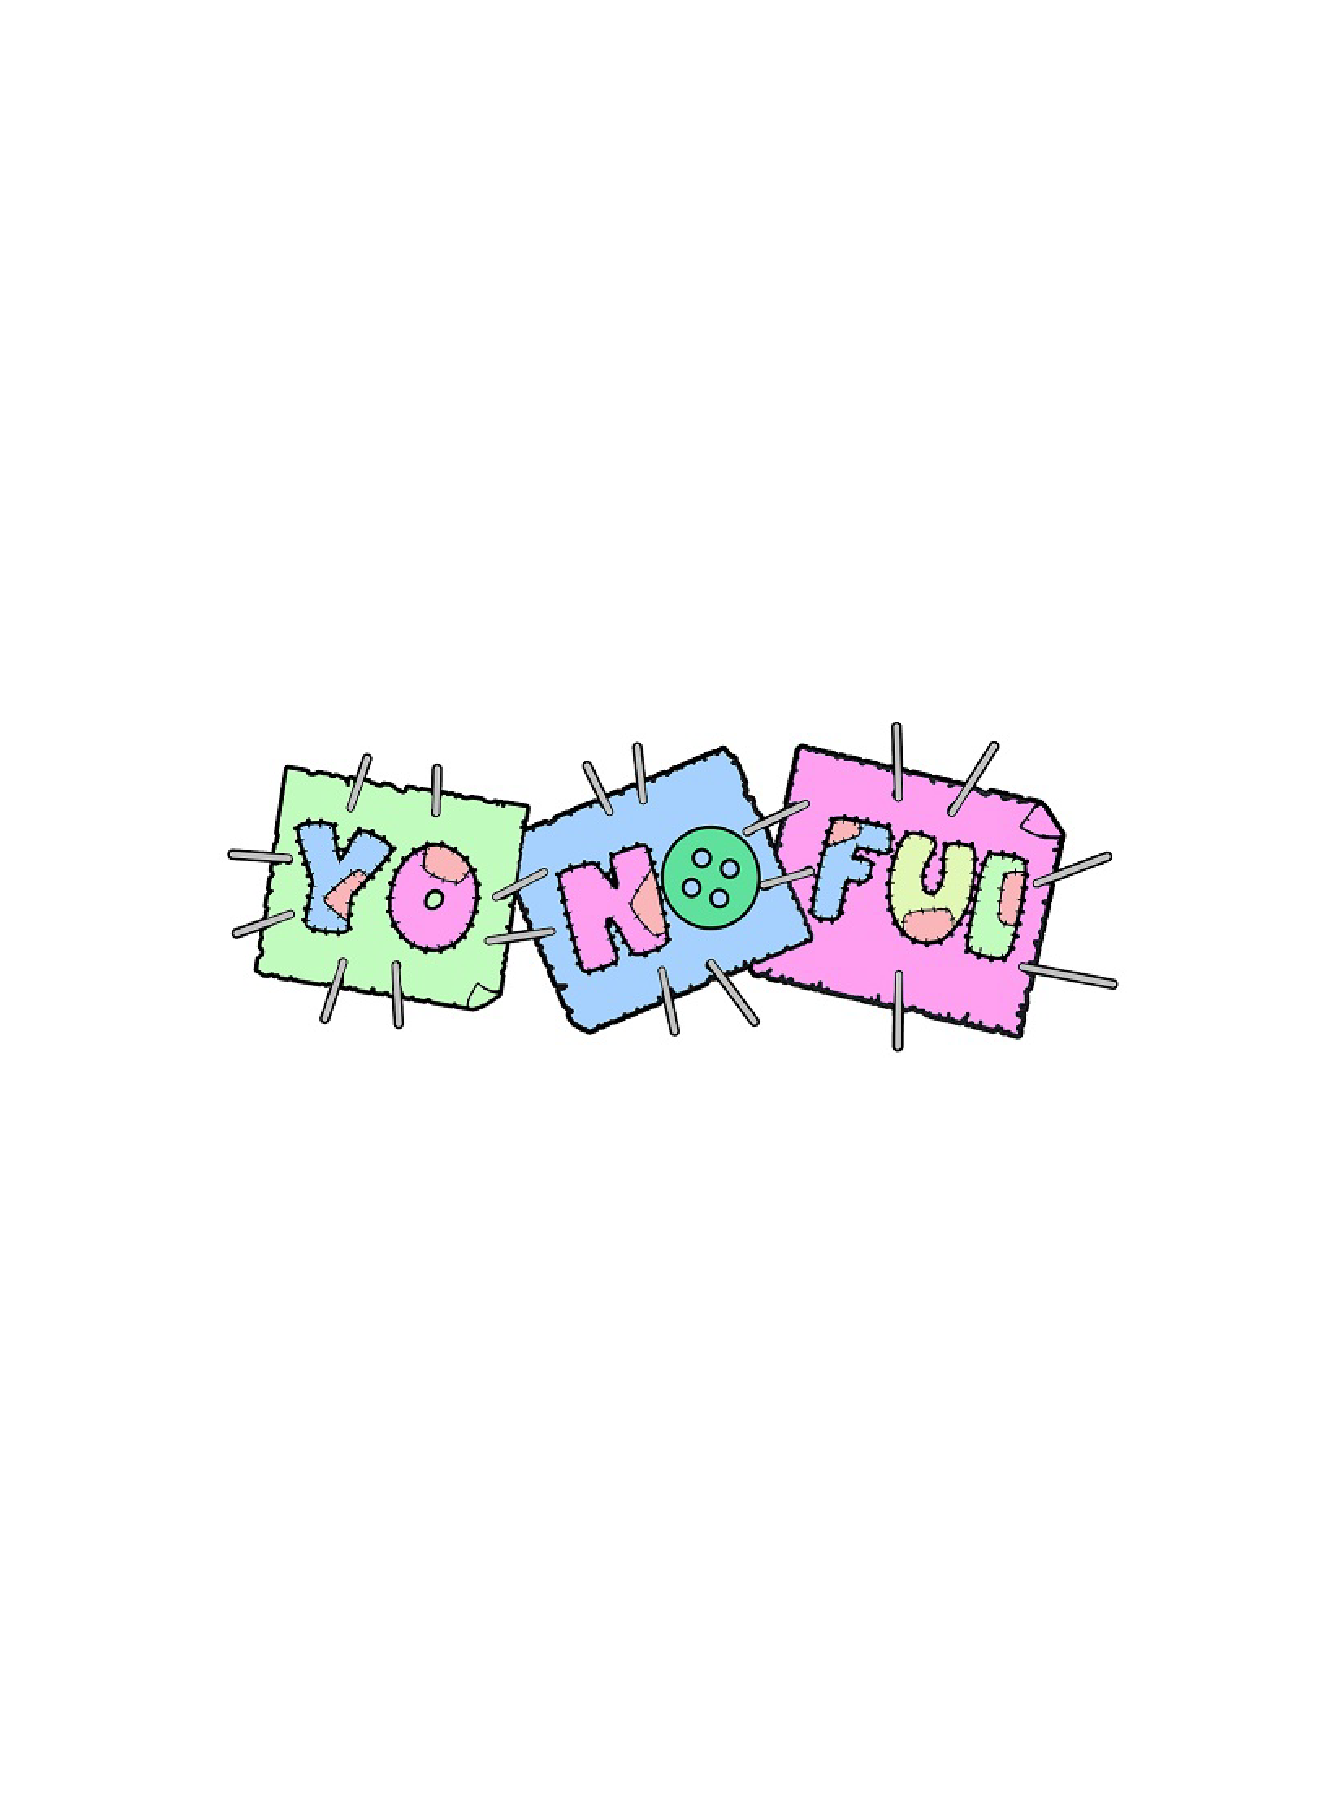 yonofui_perfil